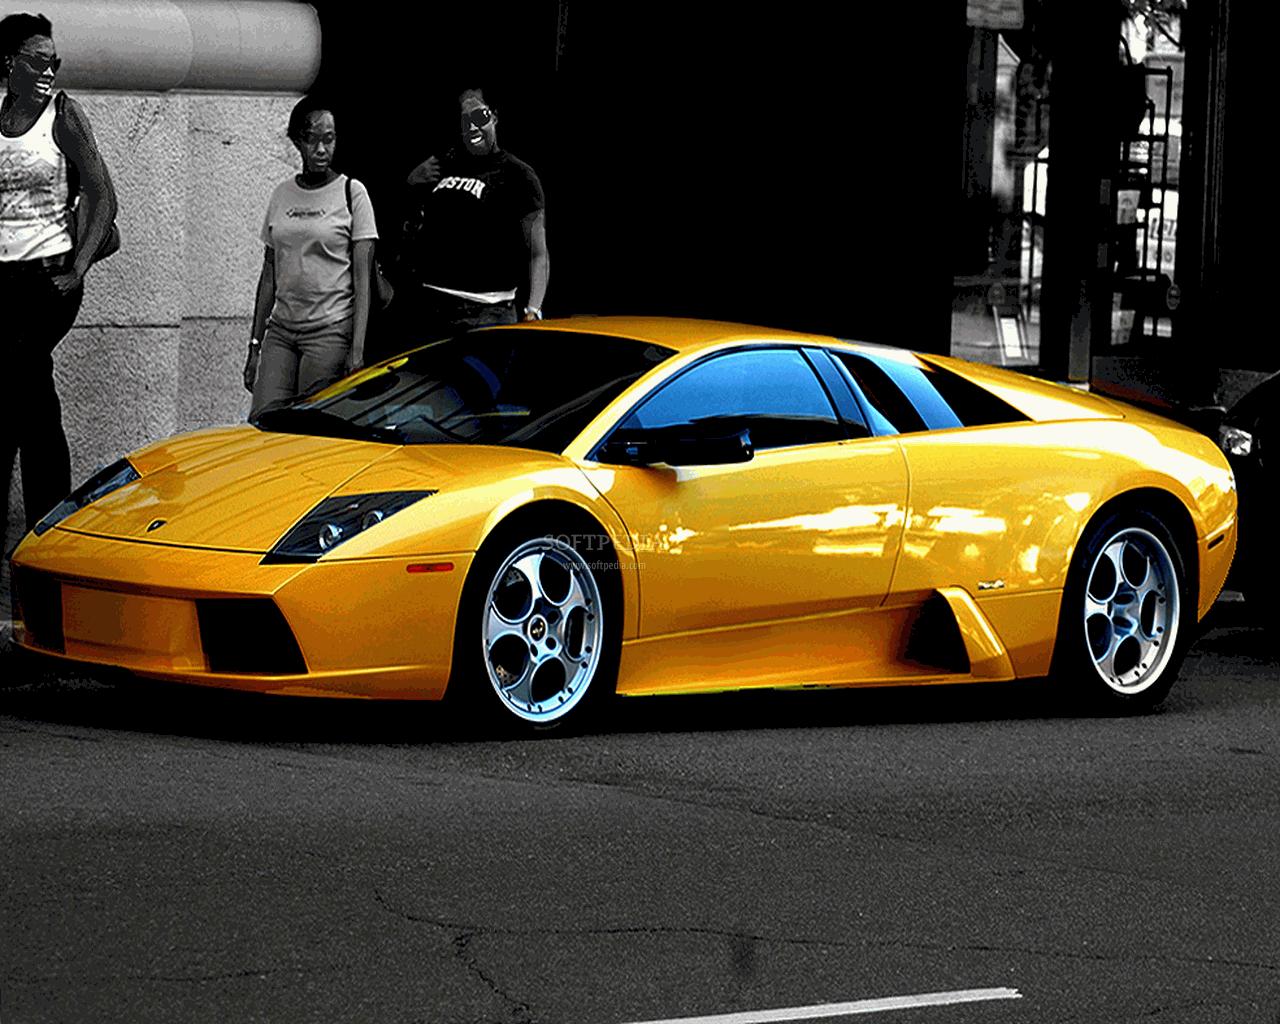 Lamborghini Wallpapers Lamborghini Screensaver Wallpaper 1280x1024